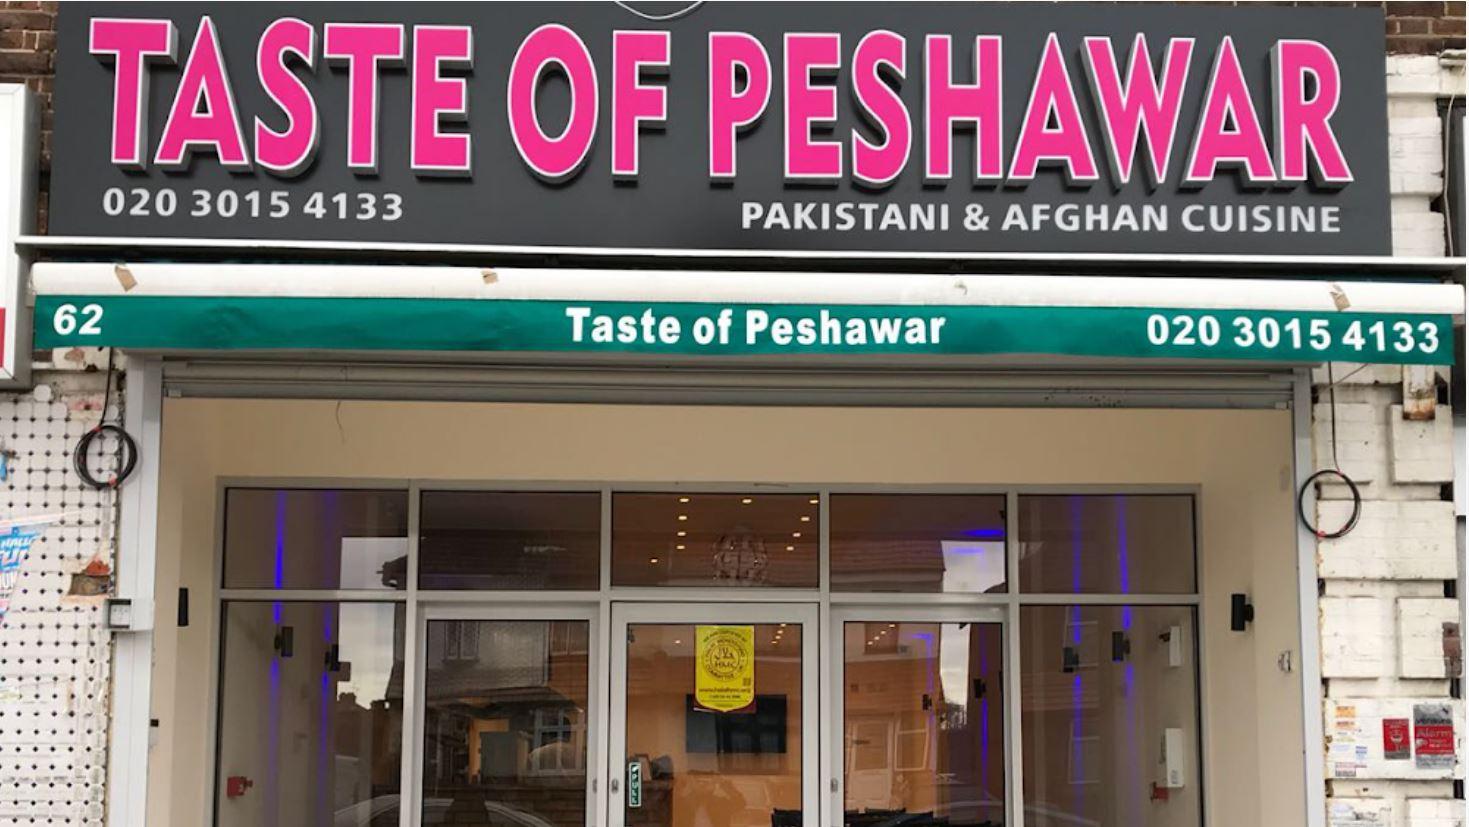 Taste of Peshawar